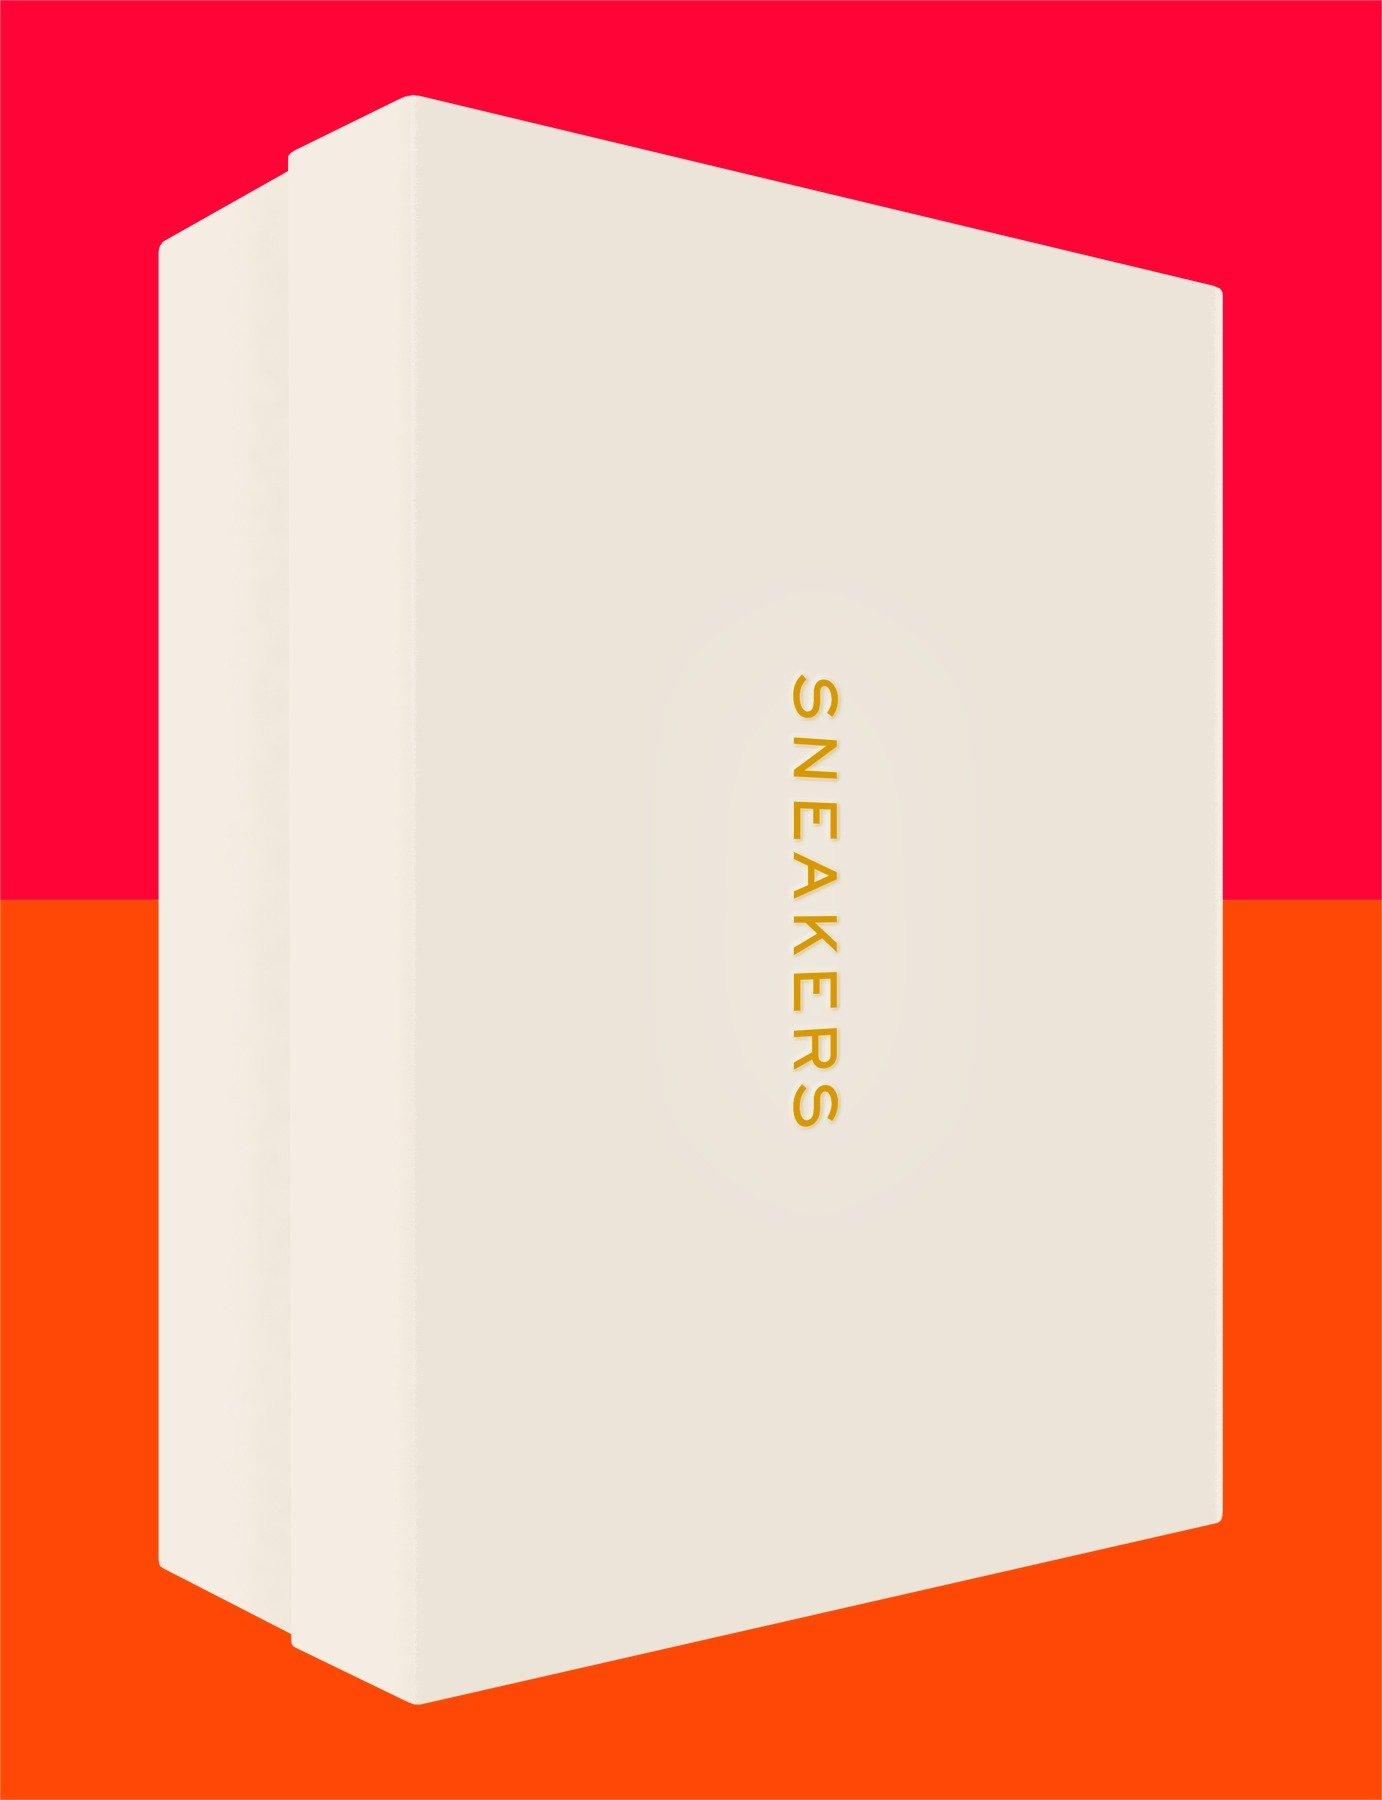 Sneakers book amazon